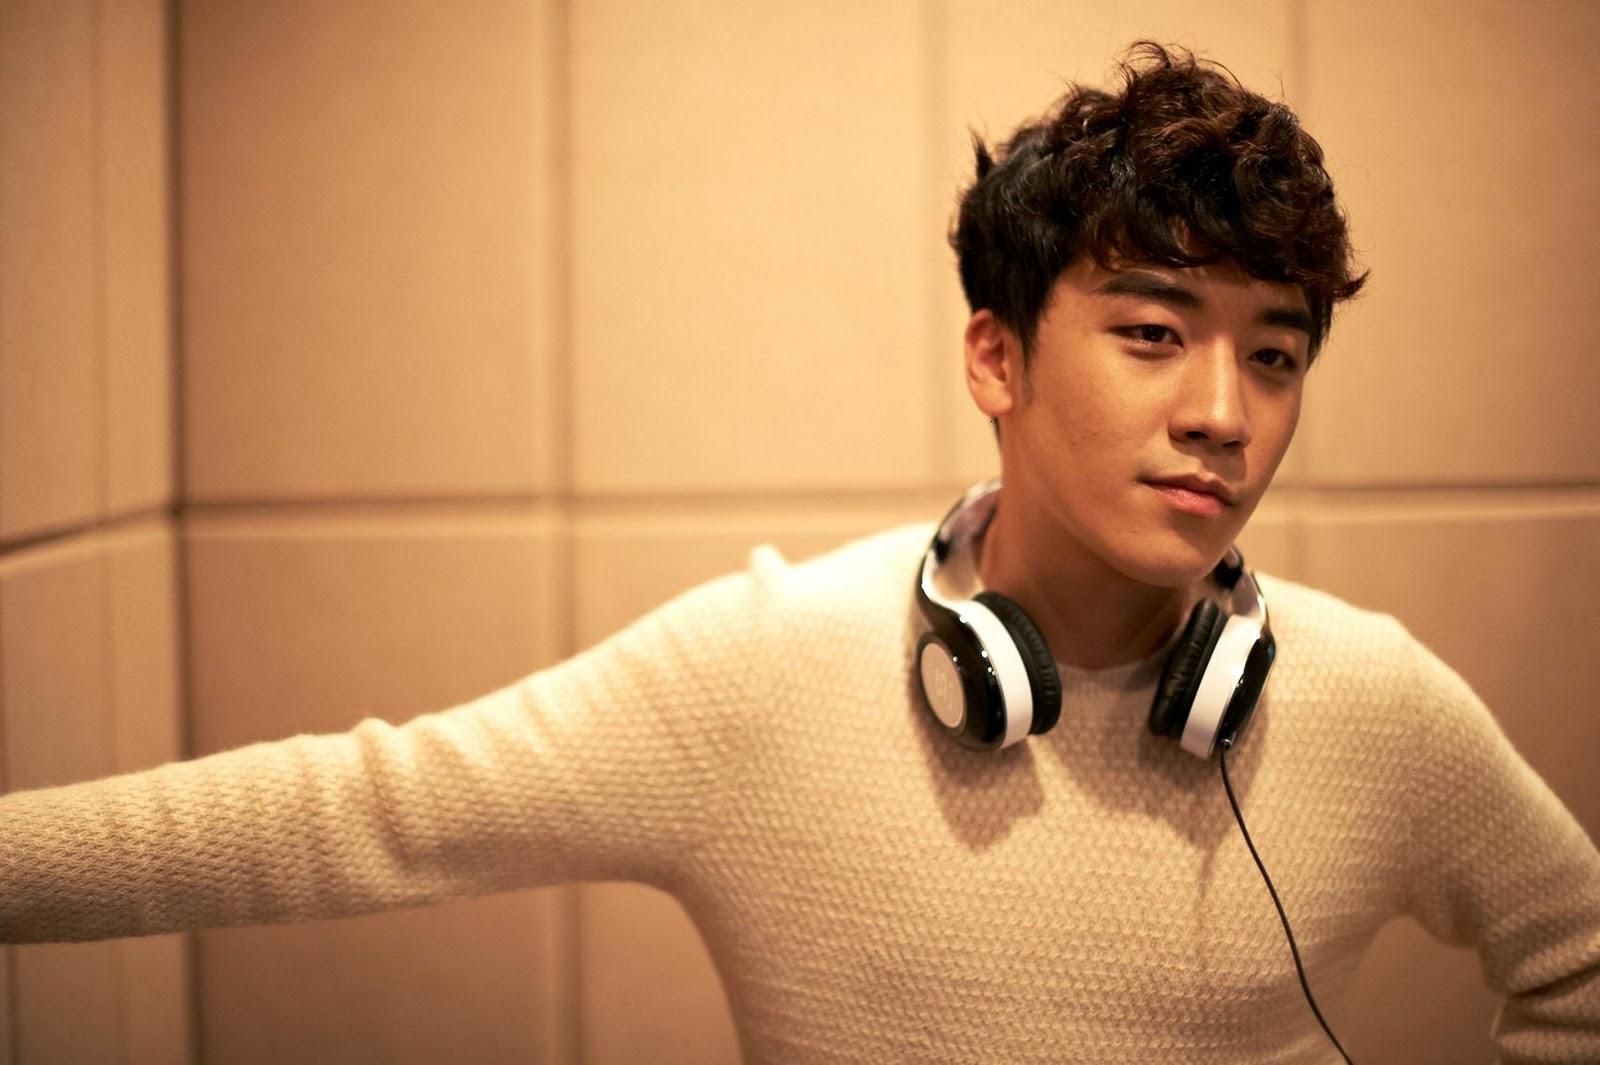 Seungri Photos Bigbang-soul-by-ludacris-headphones-bigbangupdates.com-2